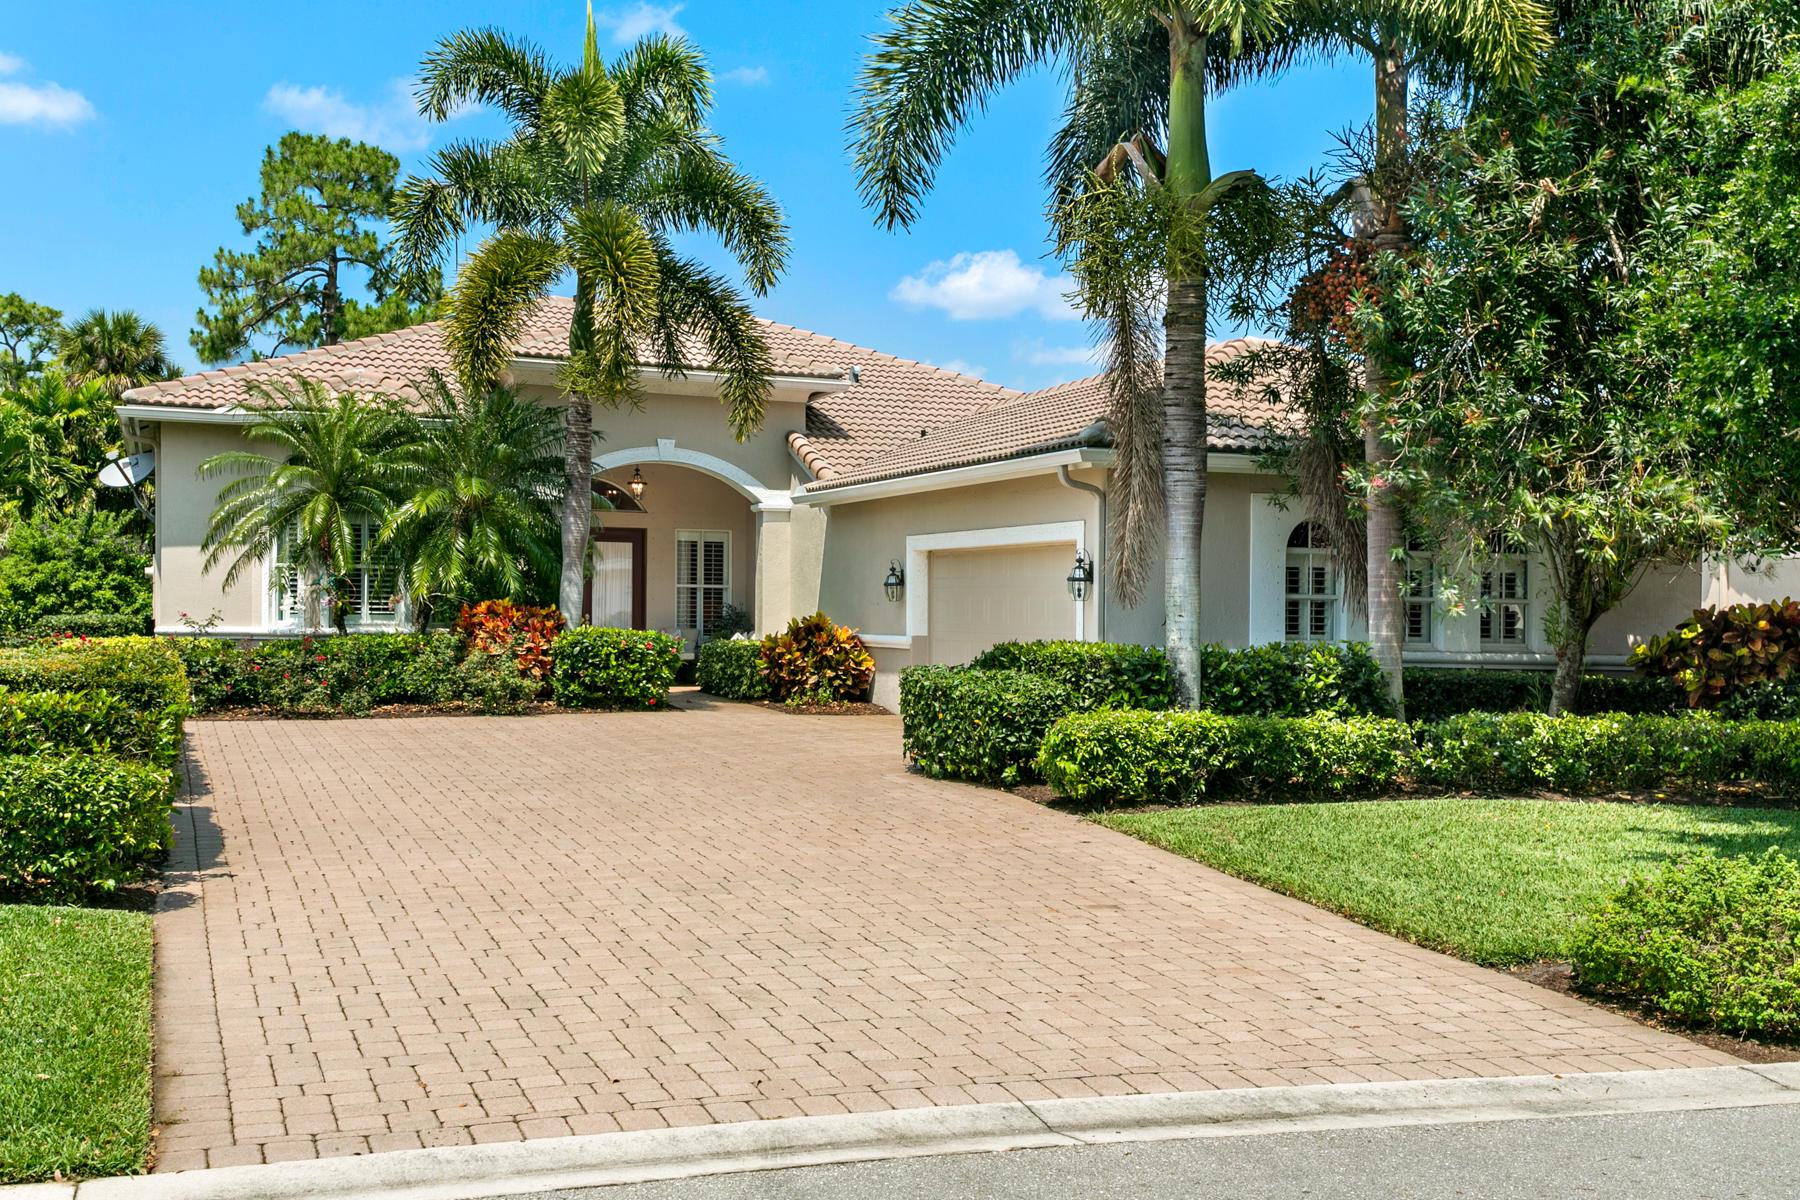 7552 Ironhorse Boulevard, West Palm Beach, Florida 33412, 3 Bedrooms Bedrooms, ,3 BathroomsBathrooms,A,Single family,Ironhorse,RX-10615835